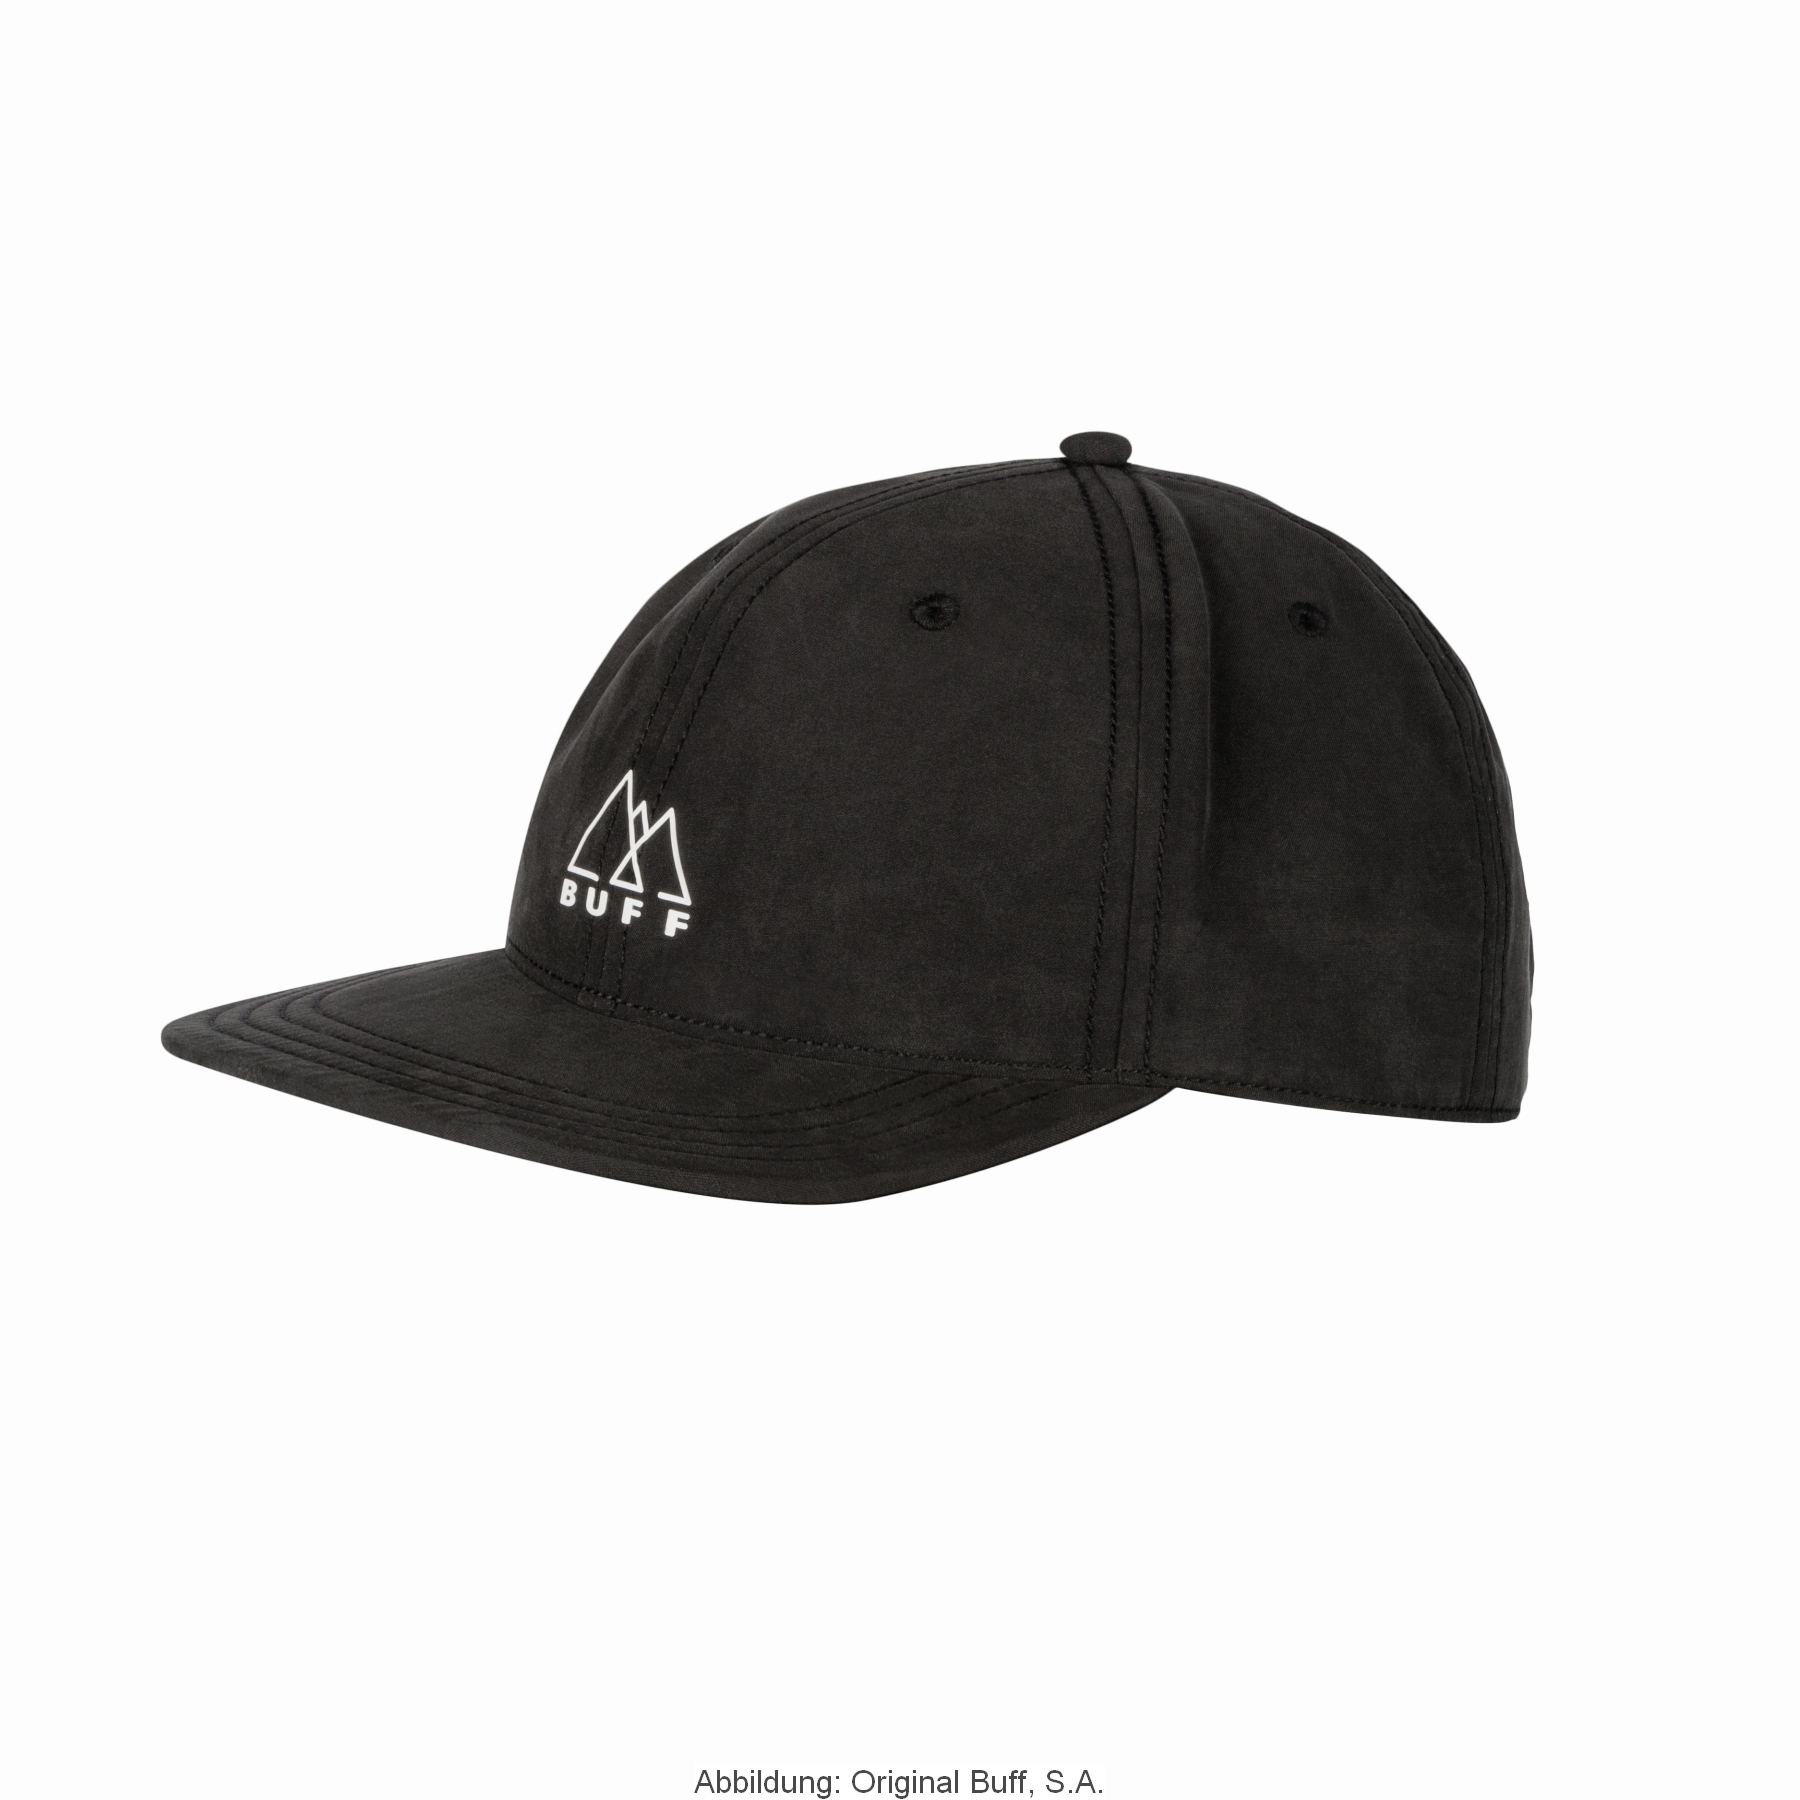 Buff® Pack Baseball Cap - Solid Black